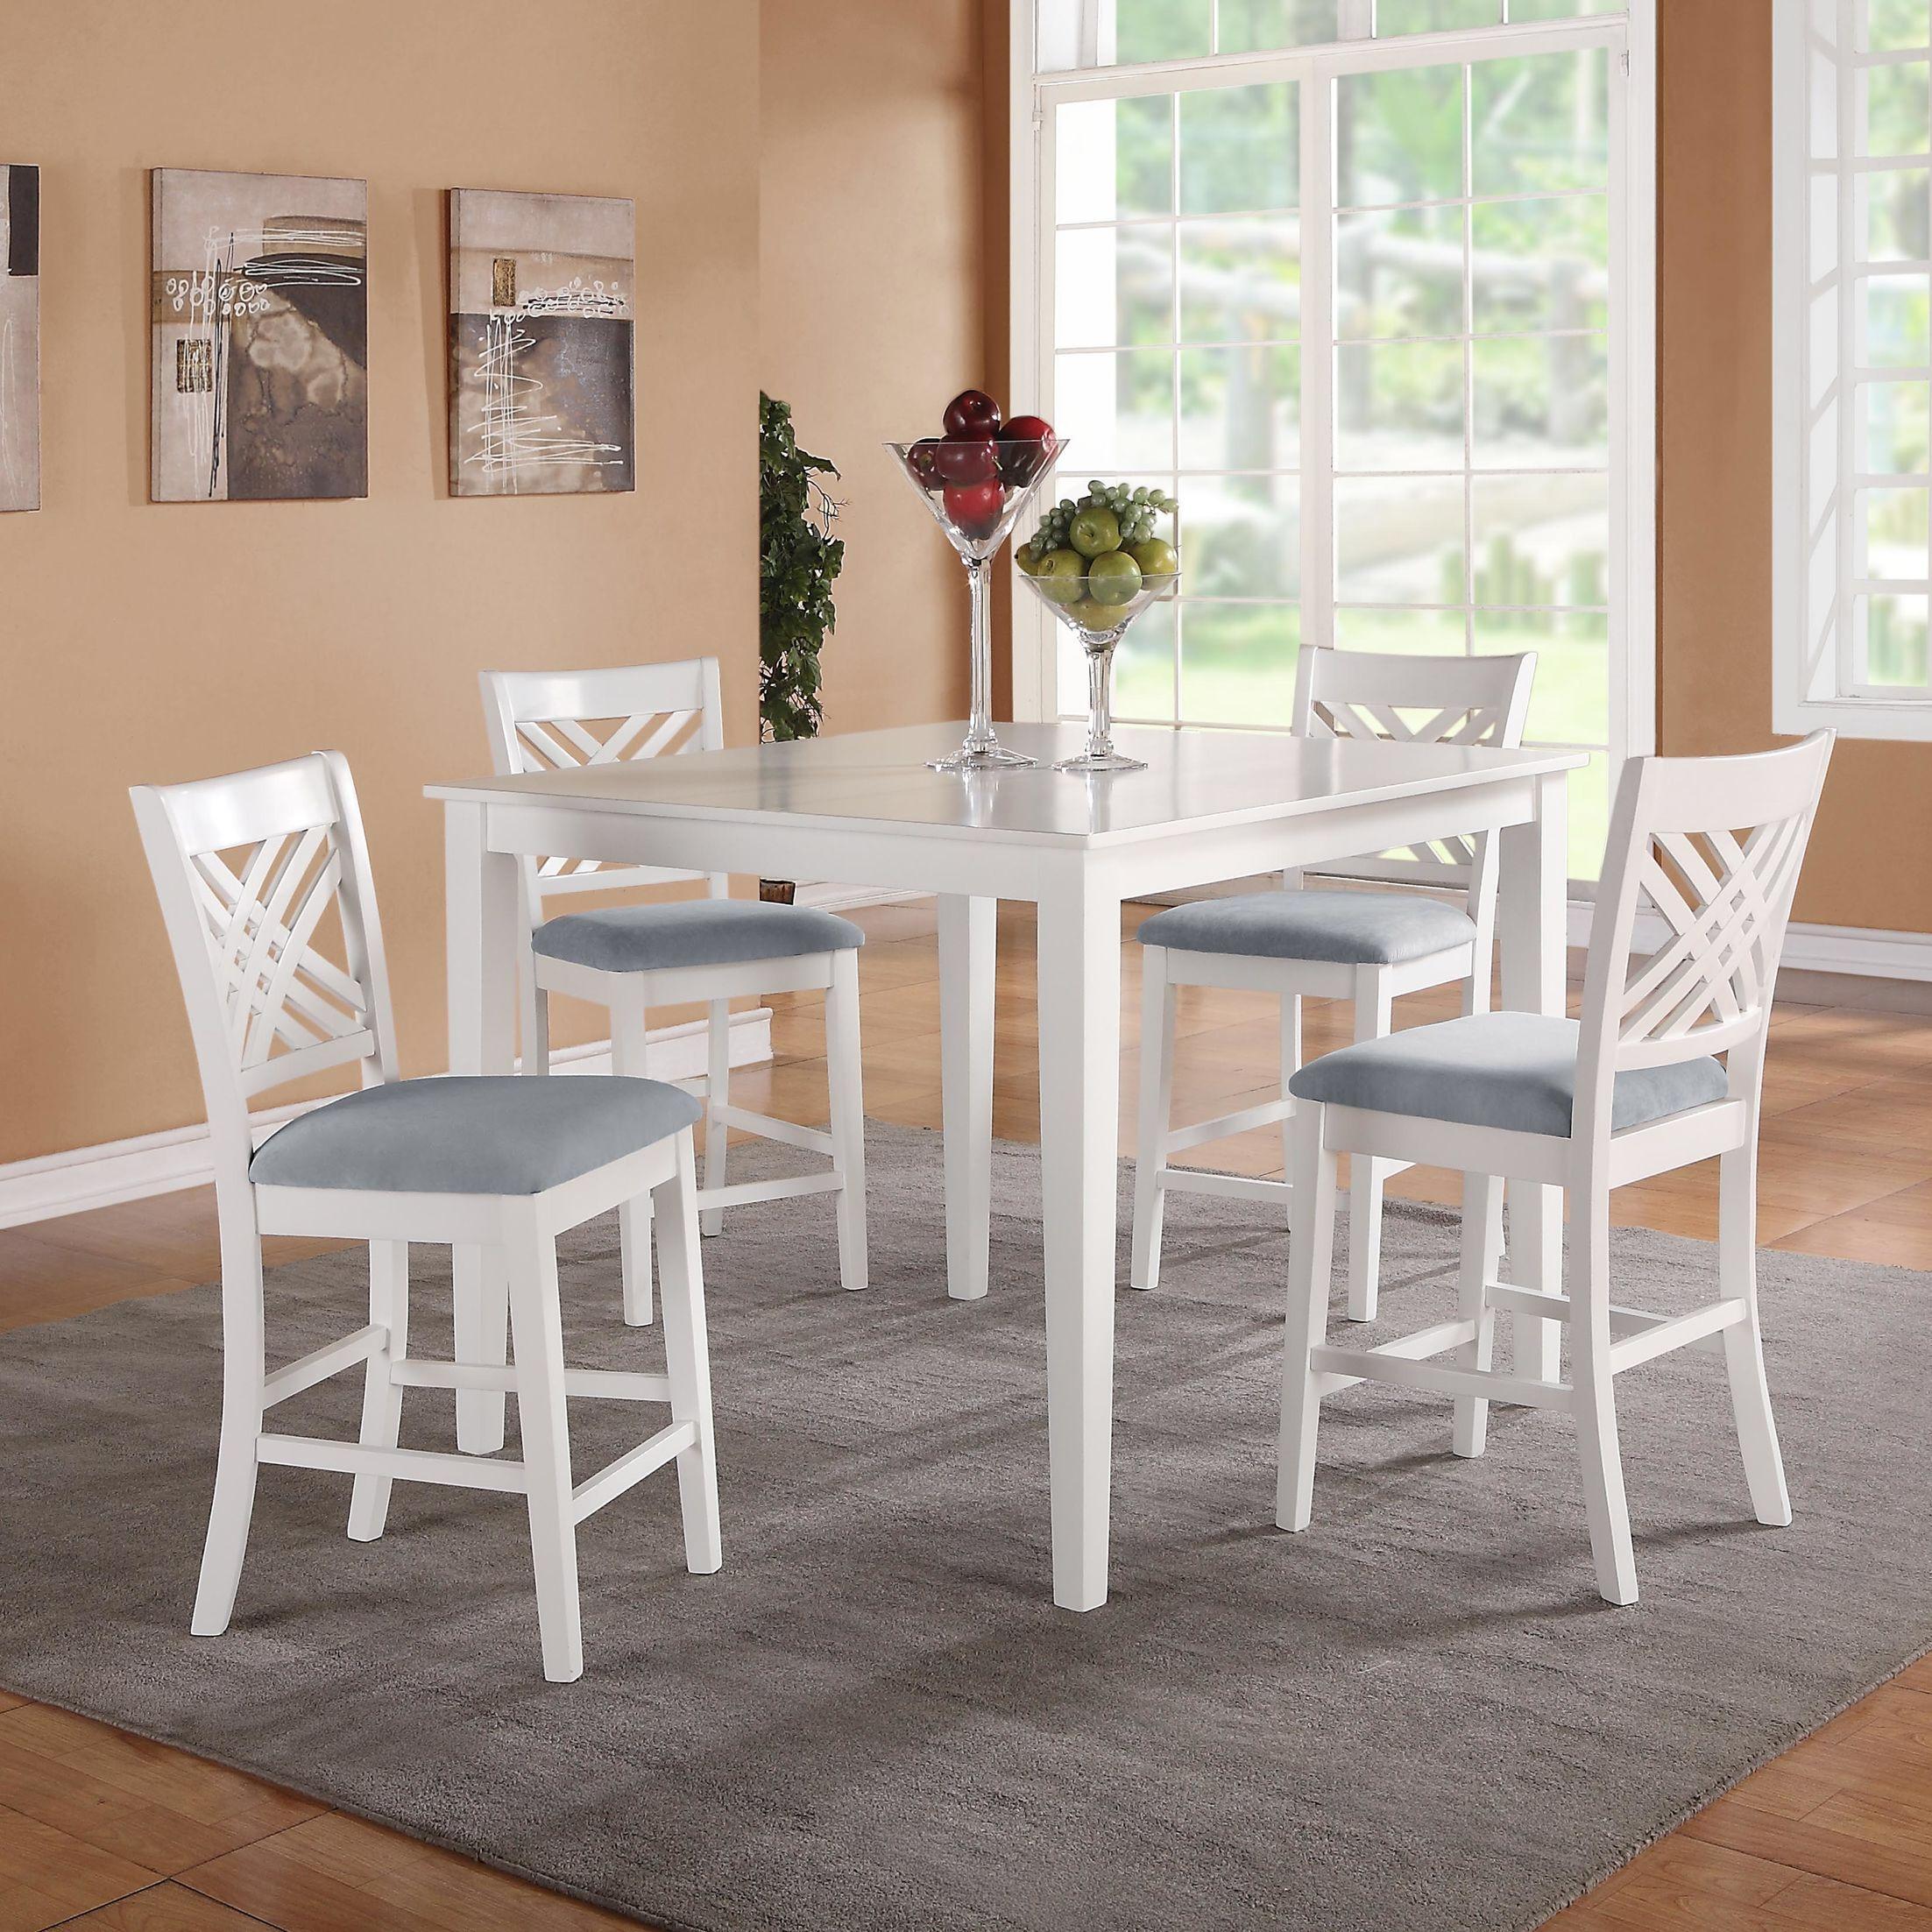 Standard Furniture Brooklyn 5 Piece Dining Set Counter Height